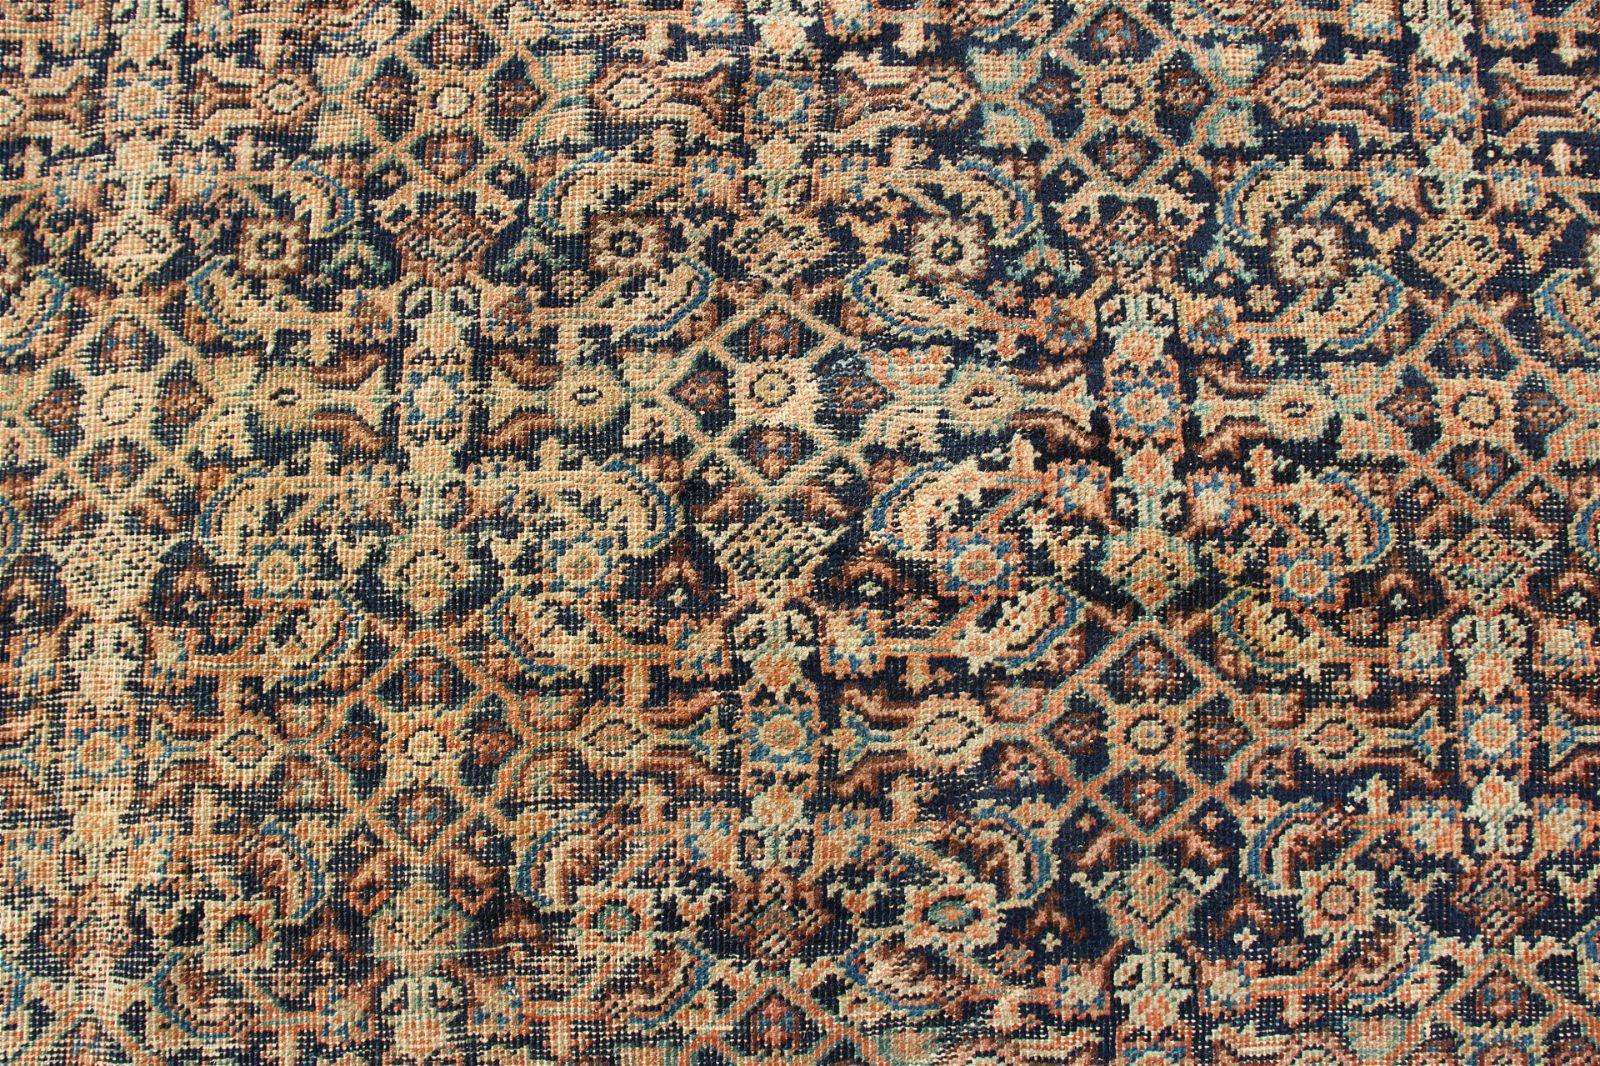 Fereghan Carpet, late 19th C